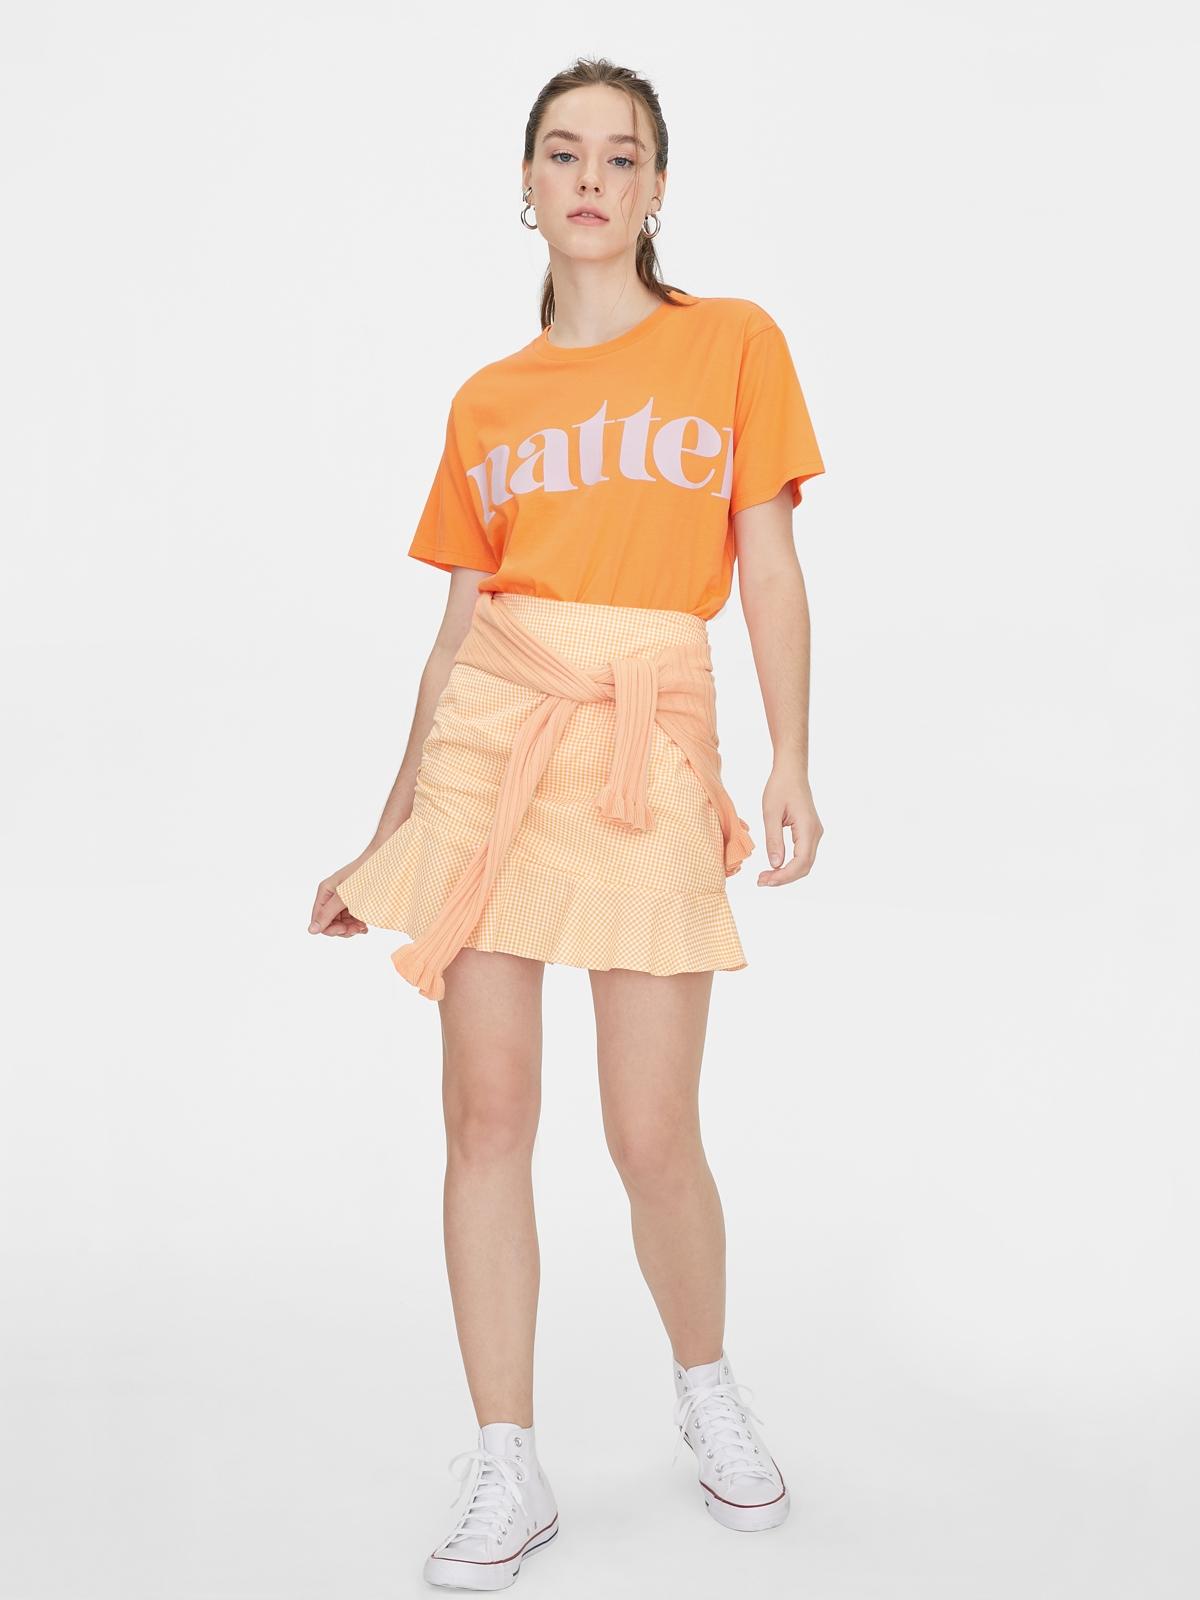 Matter Makers Signature Matter Tee Orange